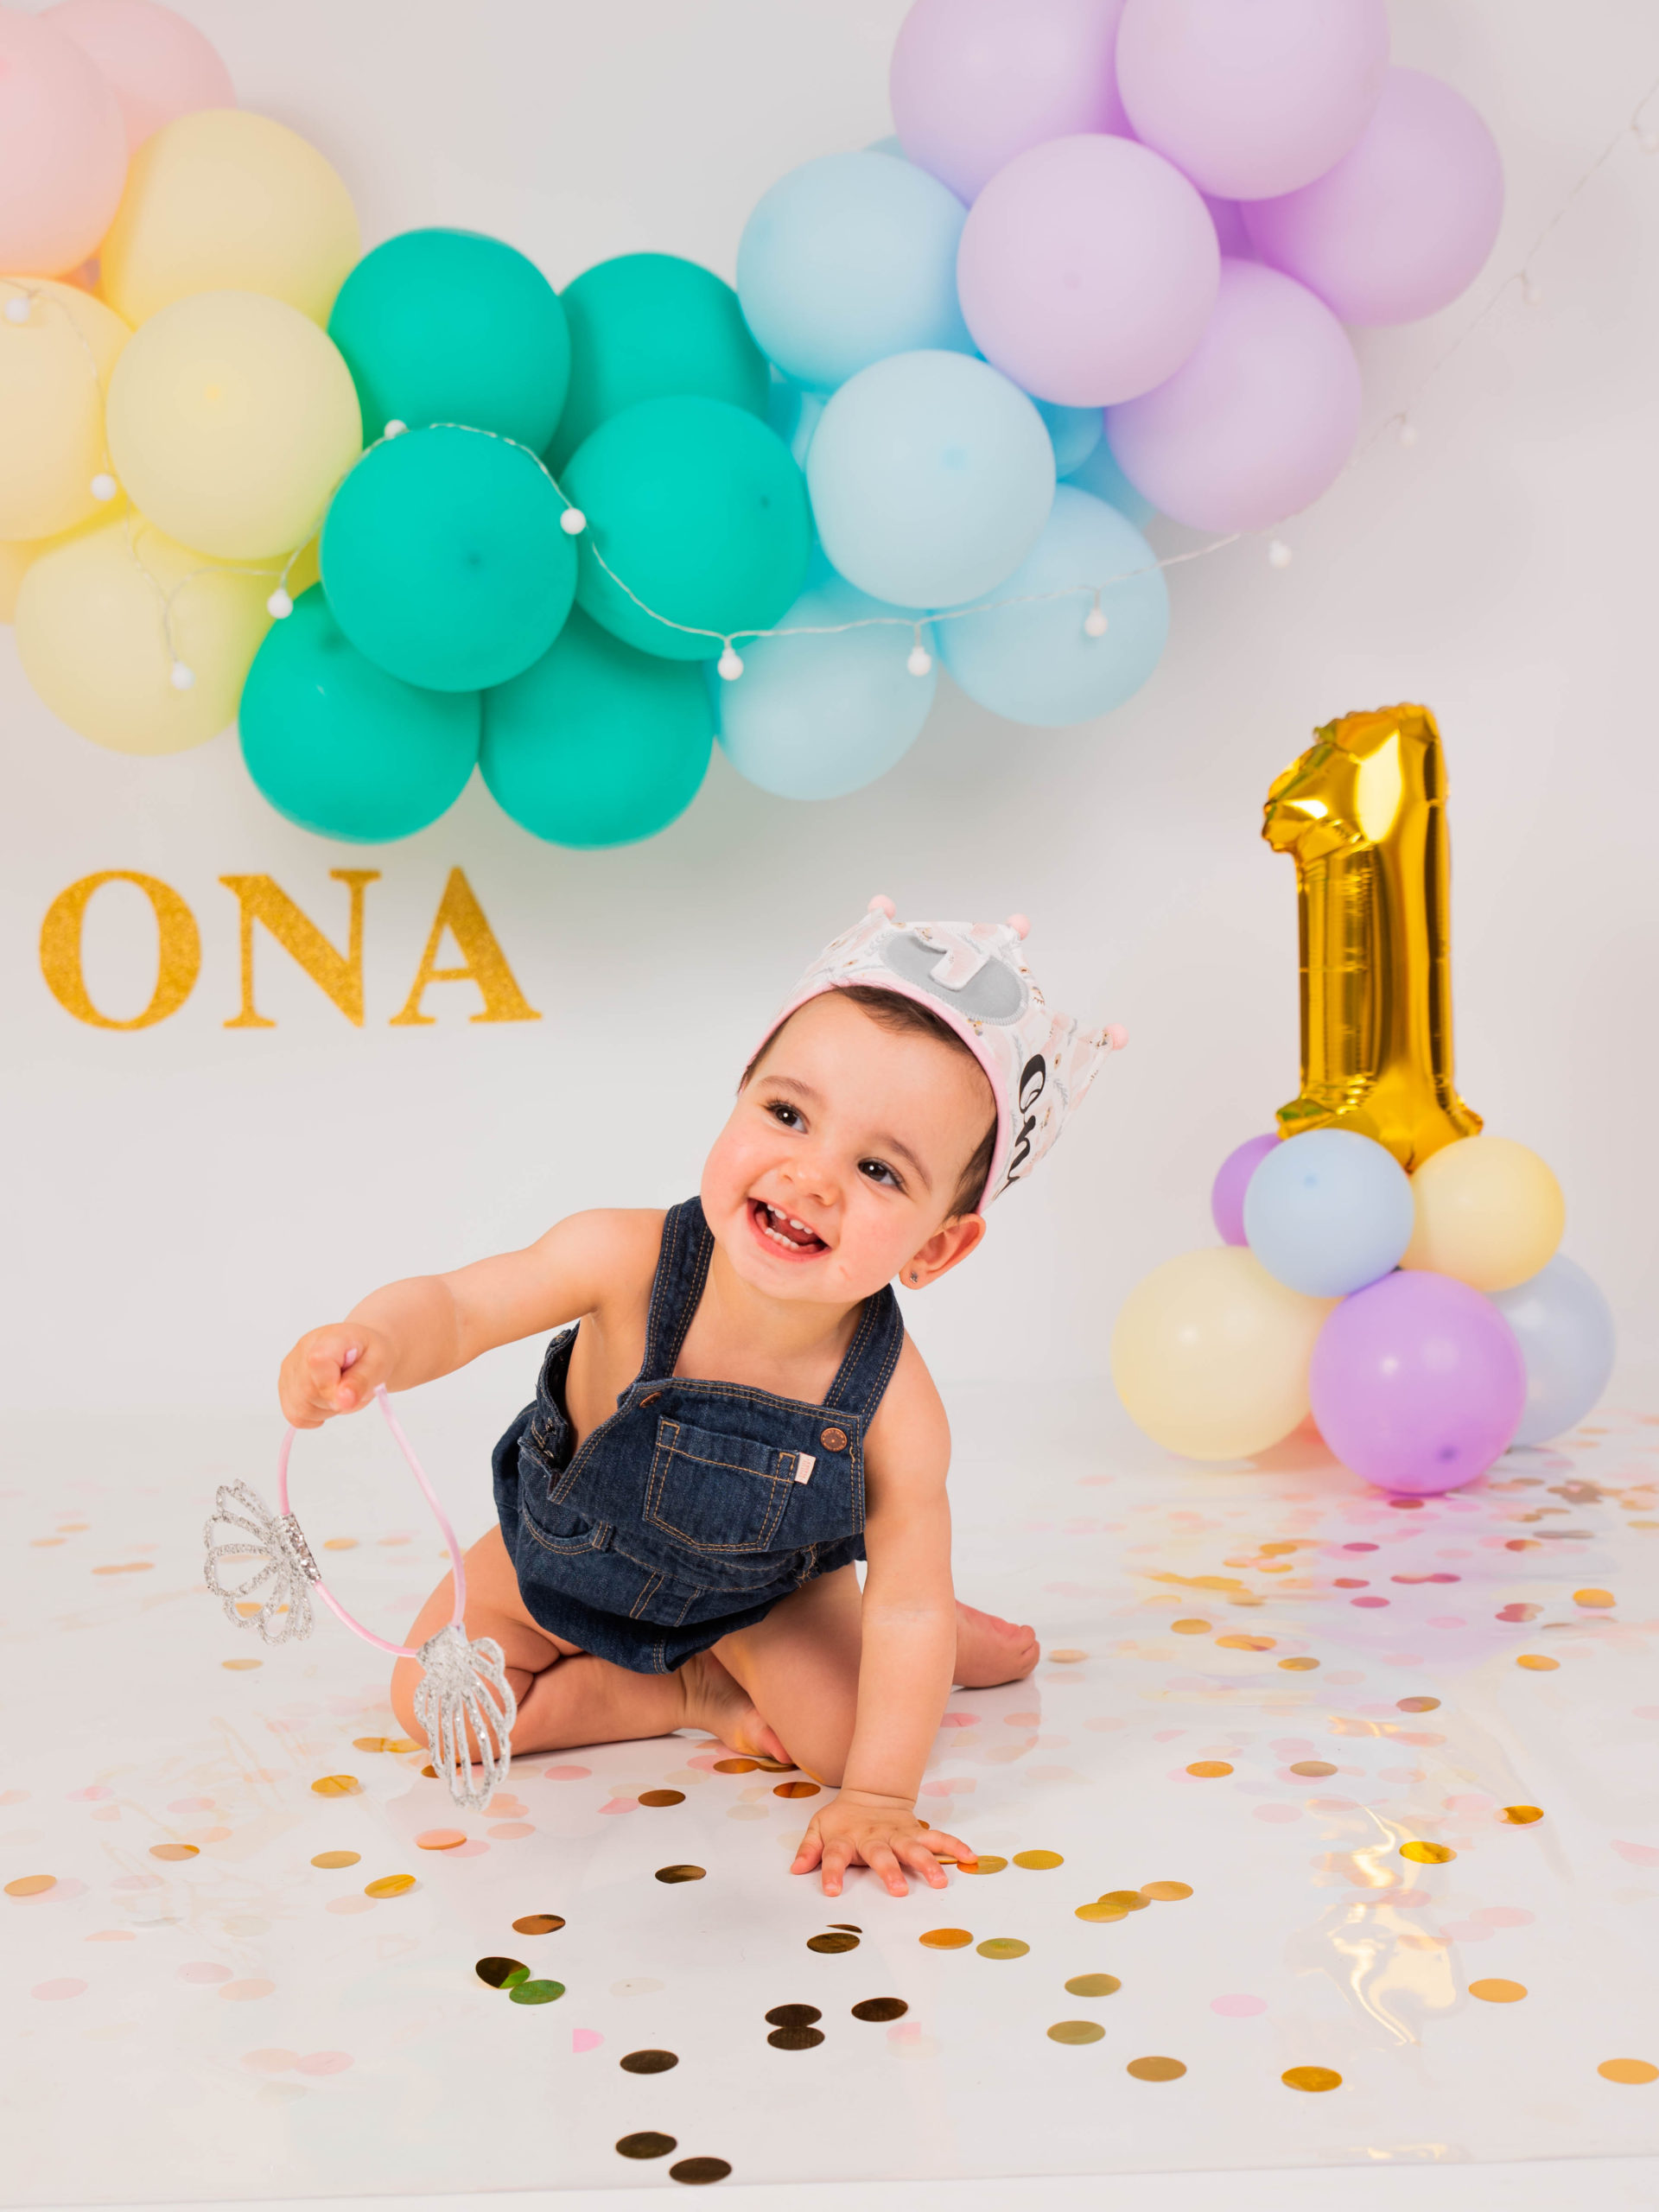 Fotografia ares jucla lleida familia newborn recent nascut maternitat embaras barcelona tarragona smash cake